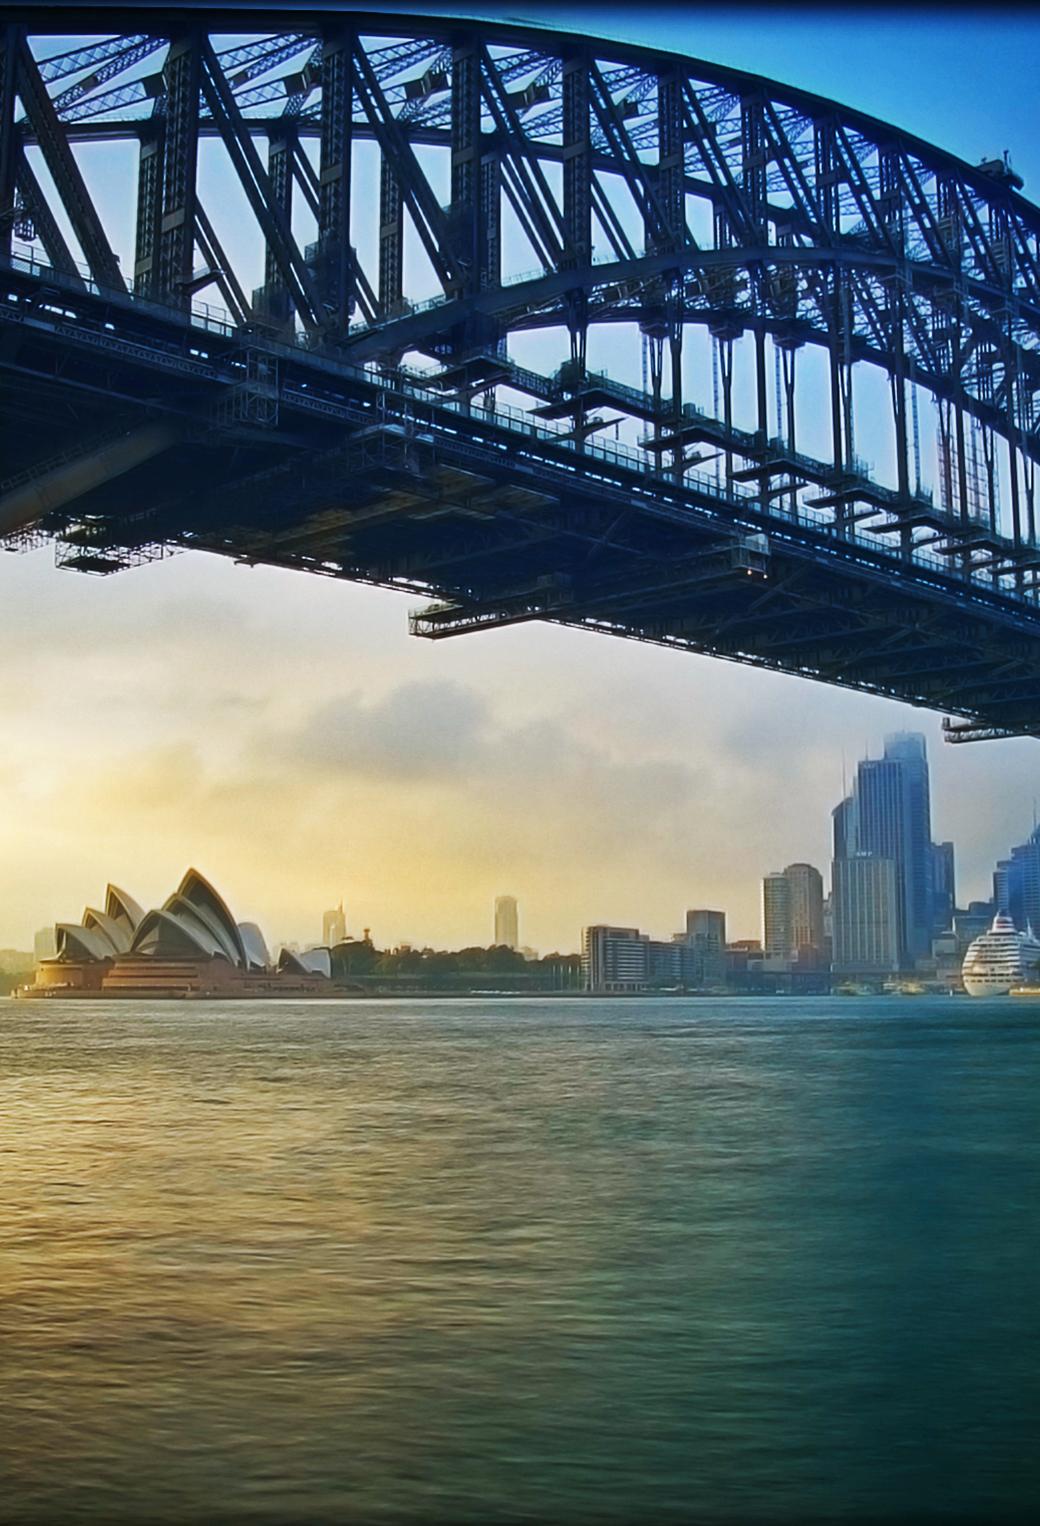 Harbour City Sydney Australia 3Wallpapers iPhone parallax Harbour City Sydney Australia